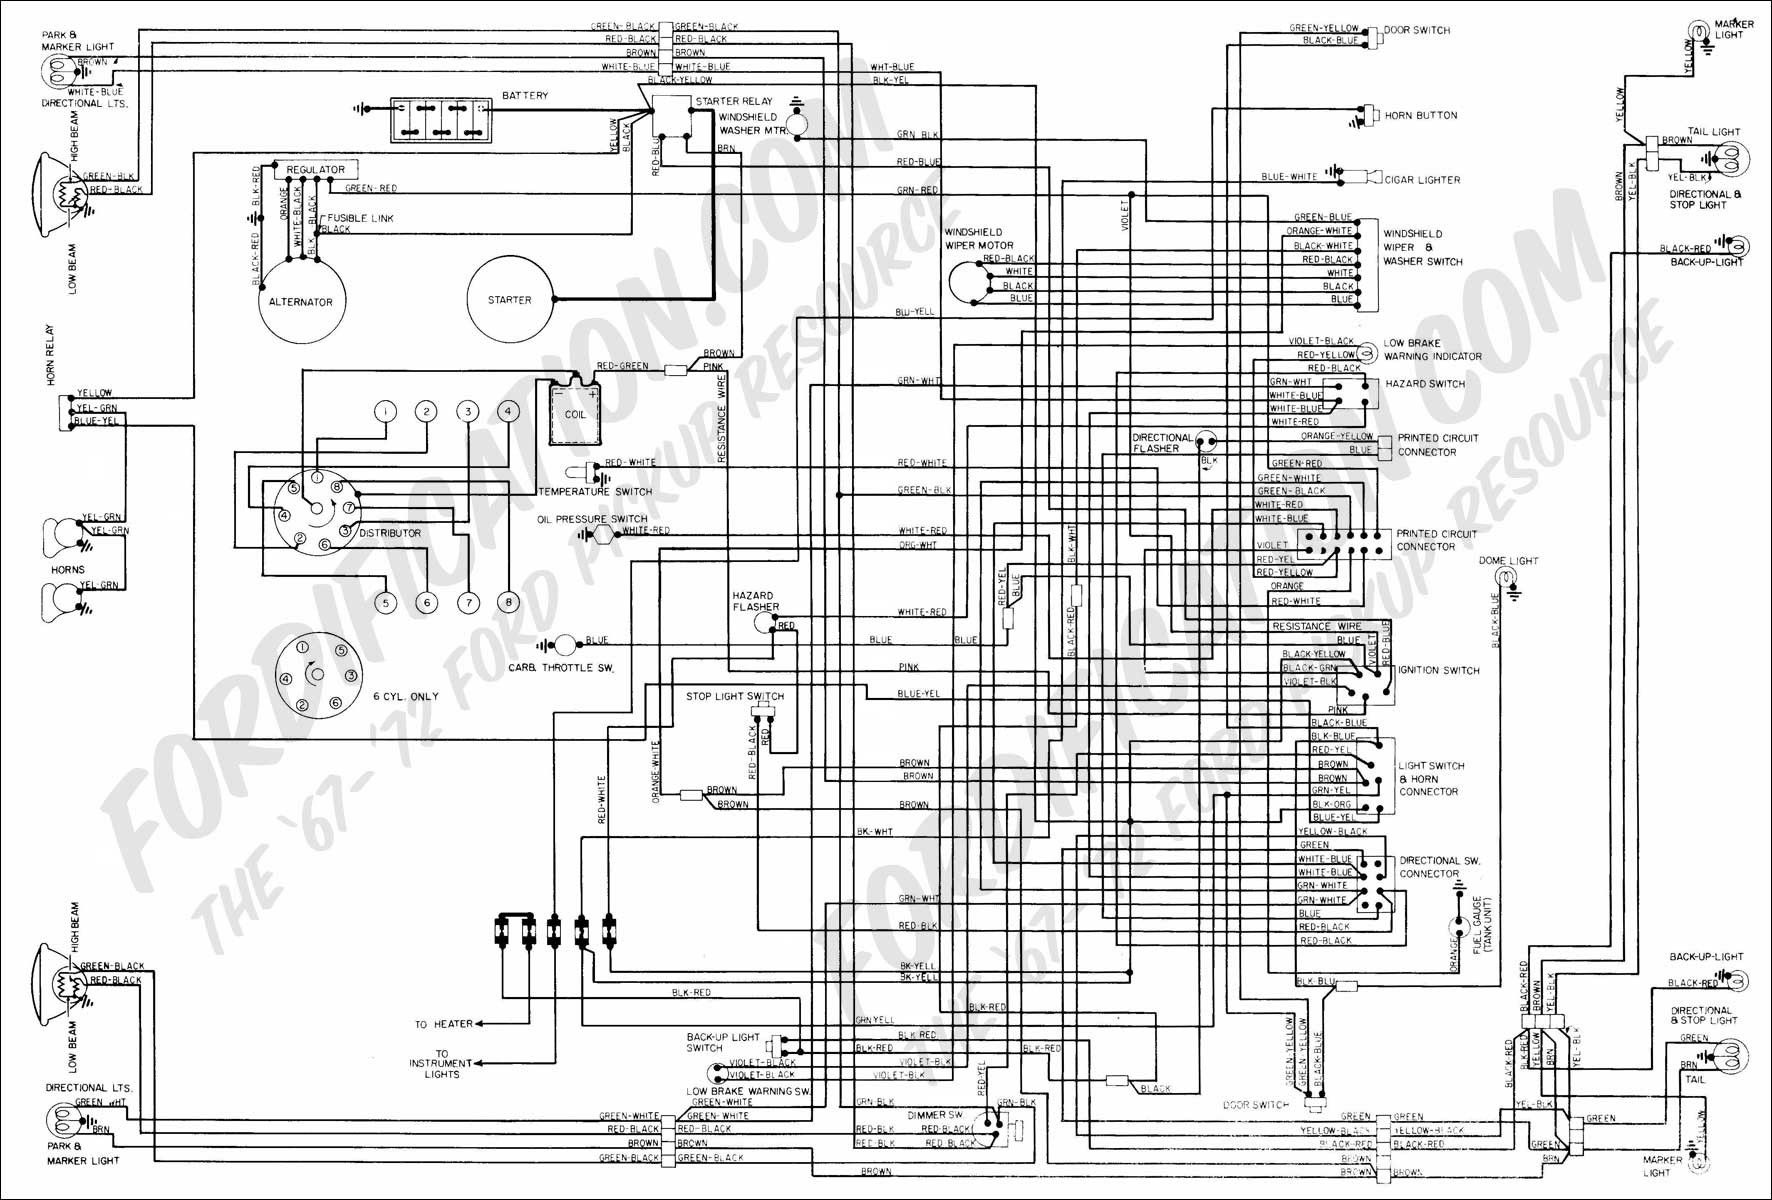 #diagram #wiringdiagram #diagramming #Diagramm #visuals #